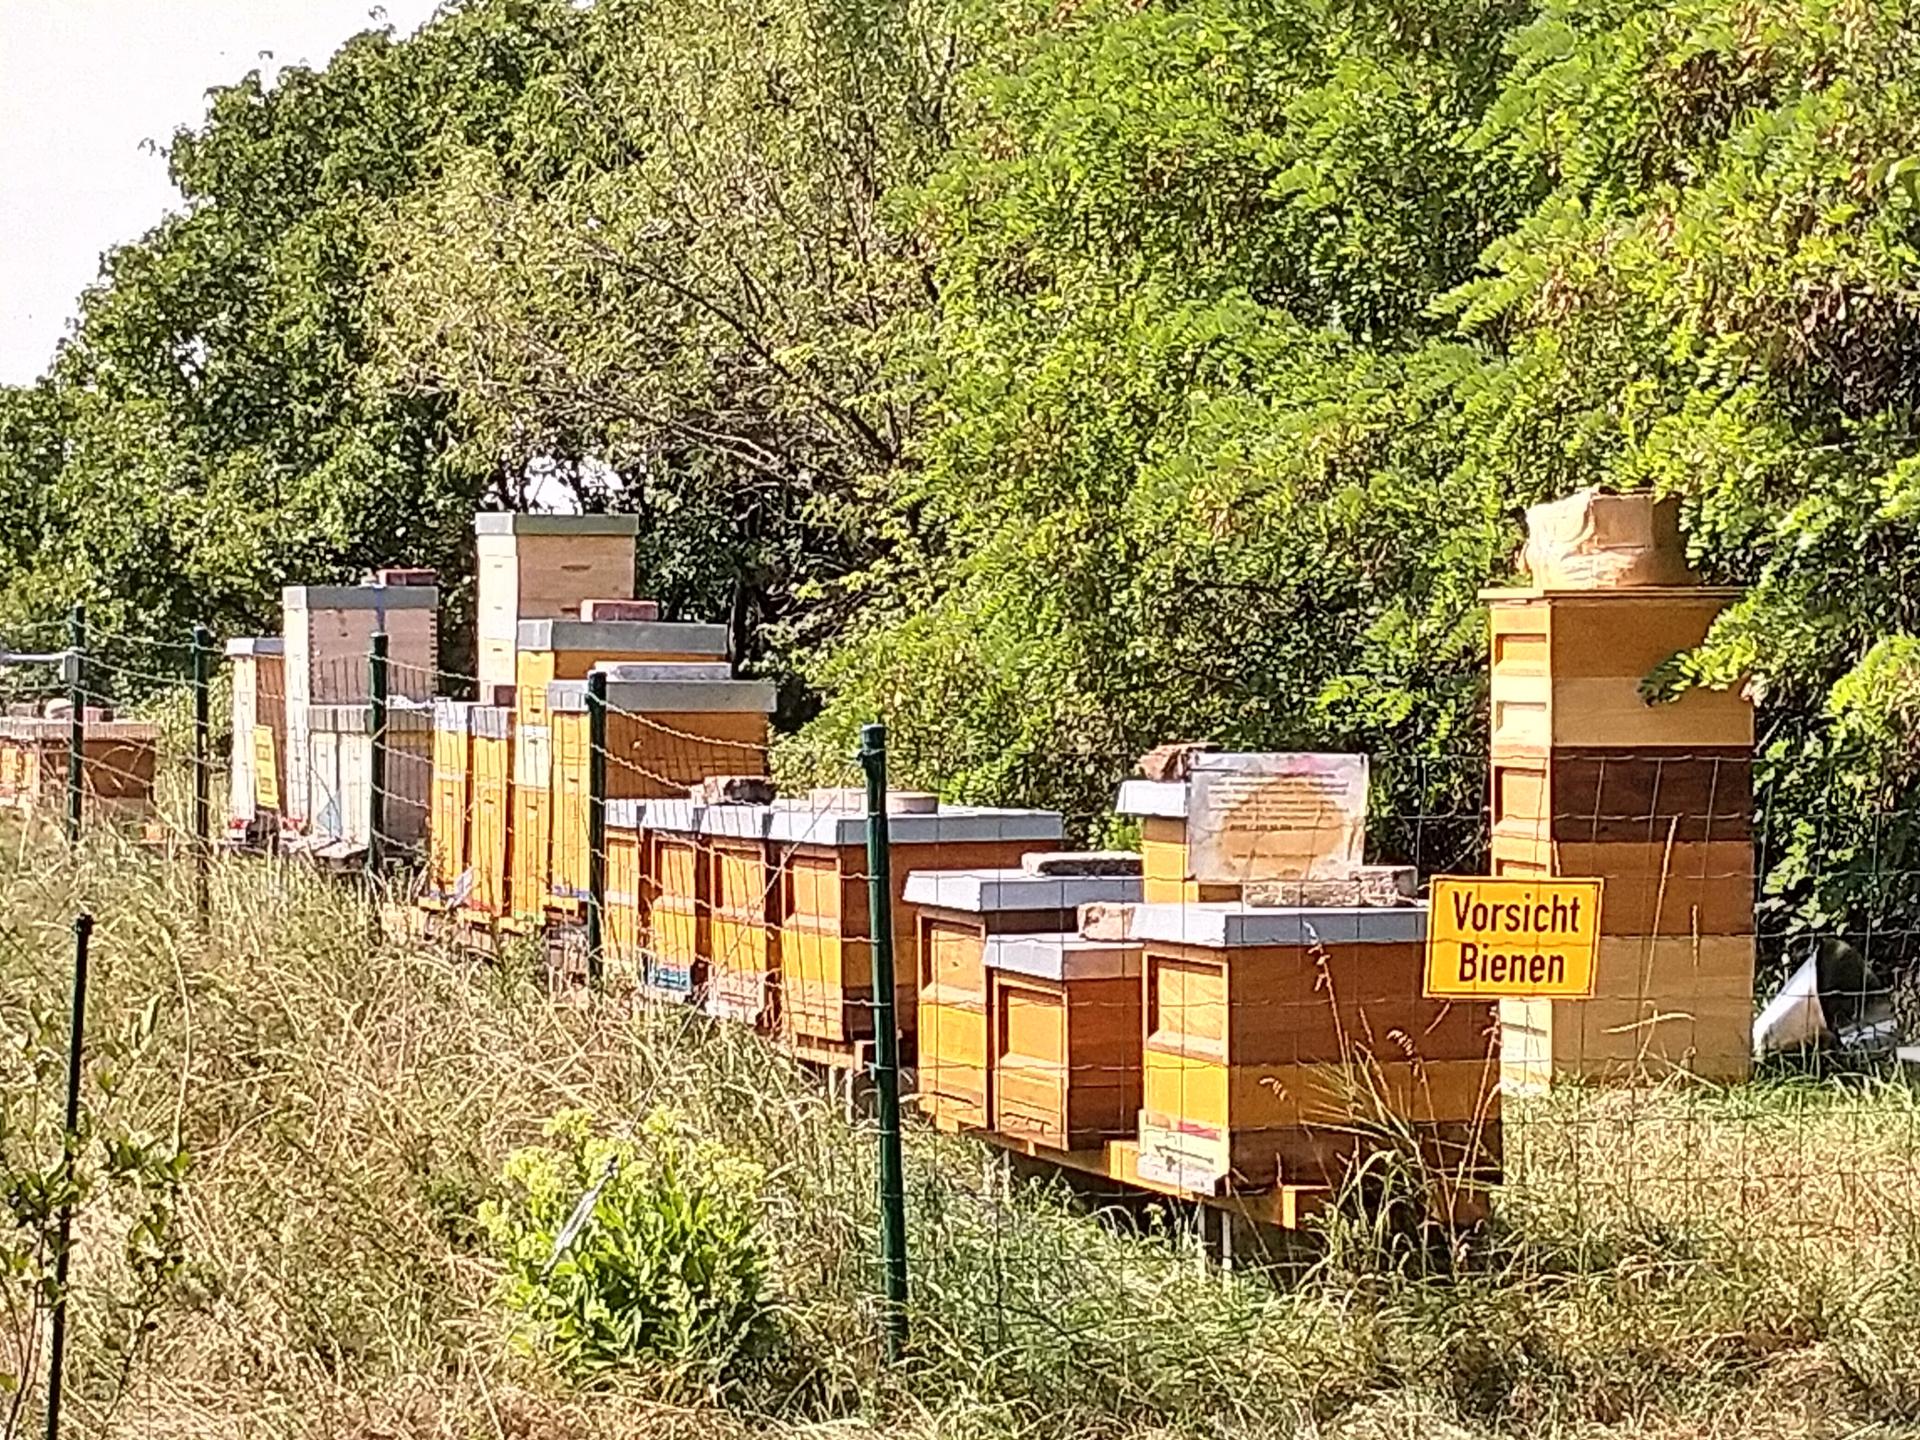 Umzäunte Bienenvölker im Stadtgebiet